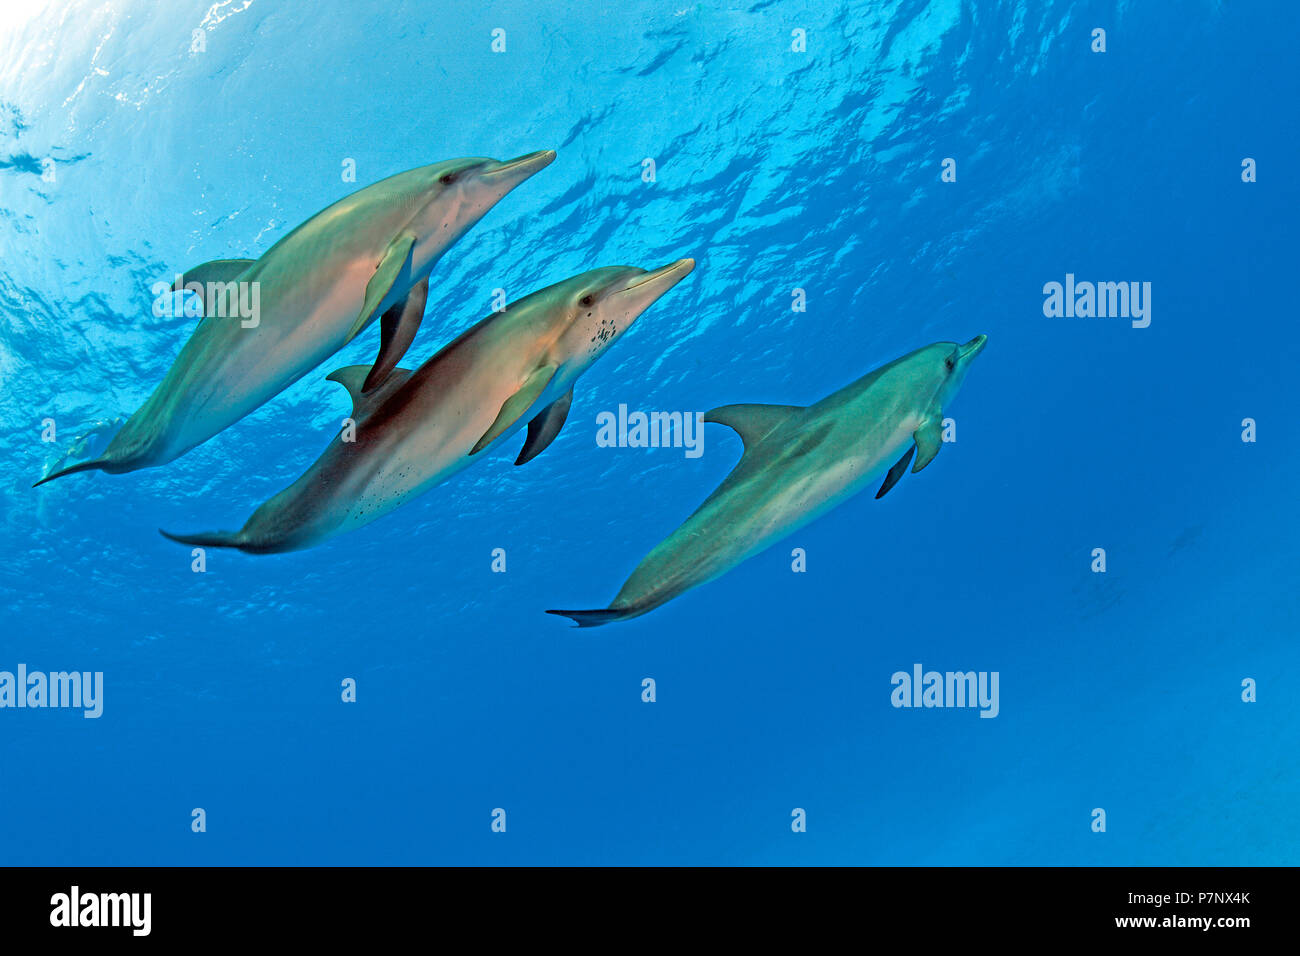 Atlantic spotted dolphin (Stenella frontalis), Grand Bahama, Bahamas - Stock Image